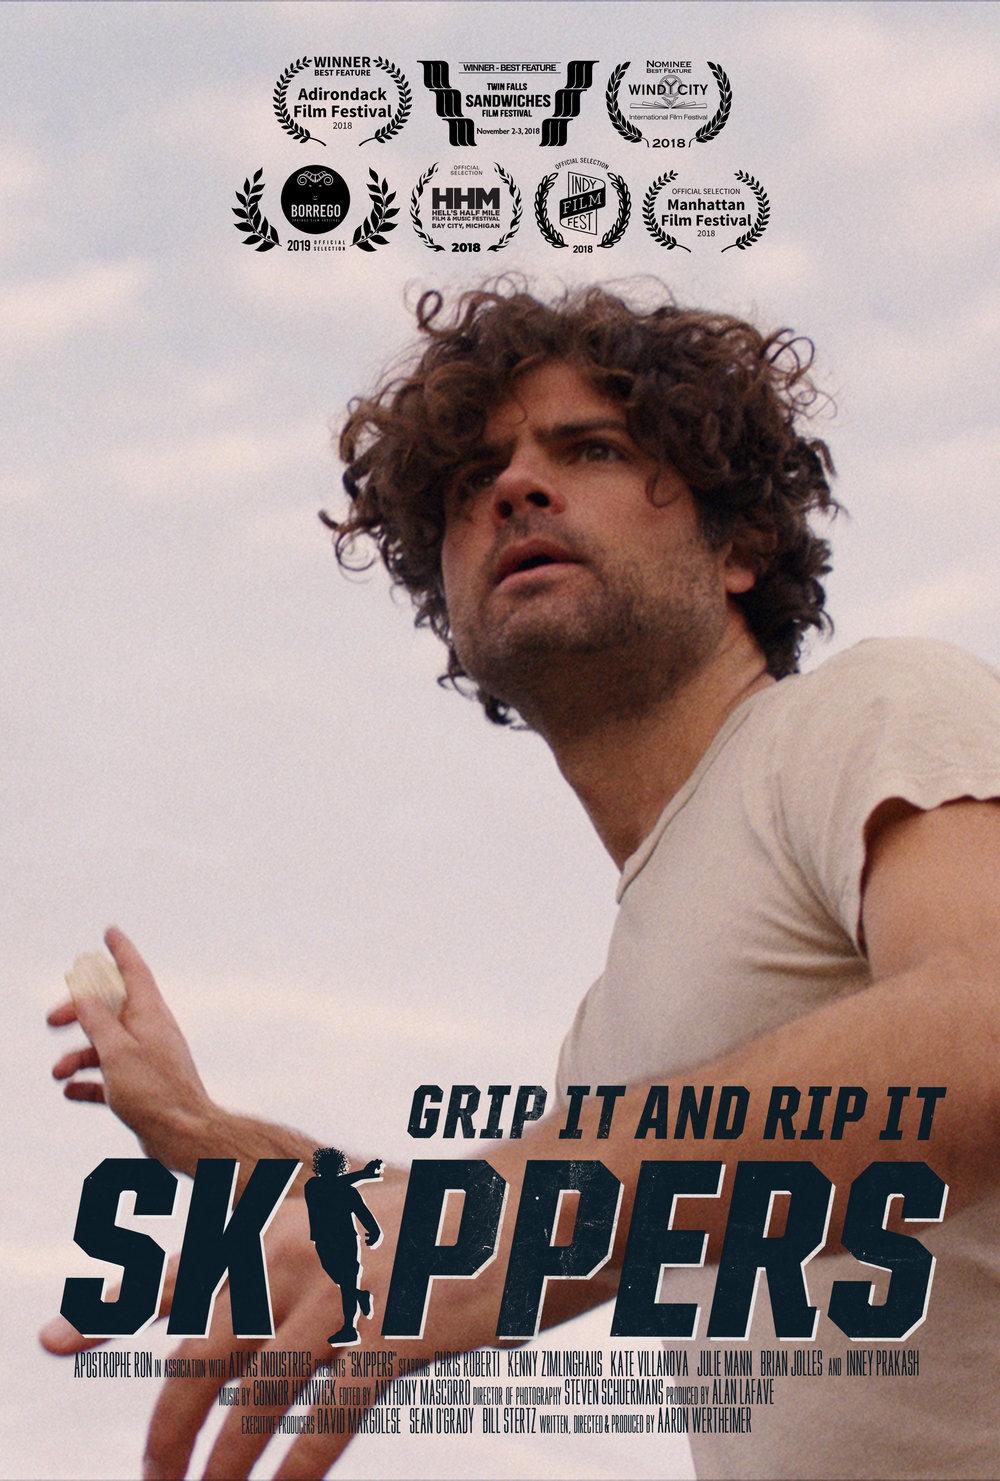 Skippers-Poster-Vertical.jpg